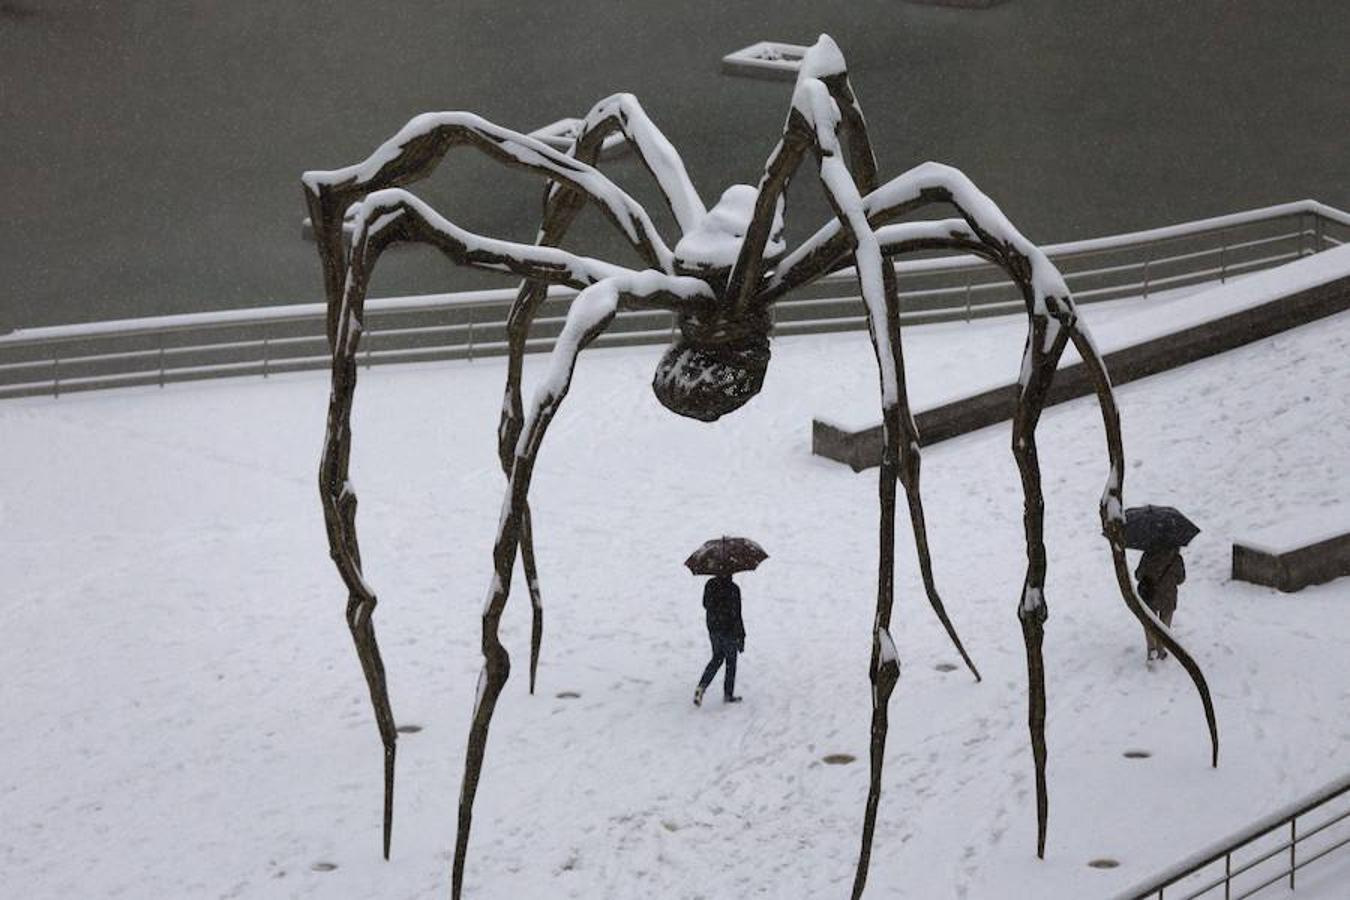 La escultura de Louise Bourgeois «mama», instalada junto al museo Guggenheim de Bilbao, cubiera de nieve